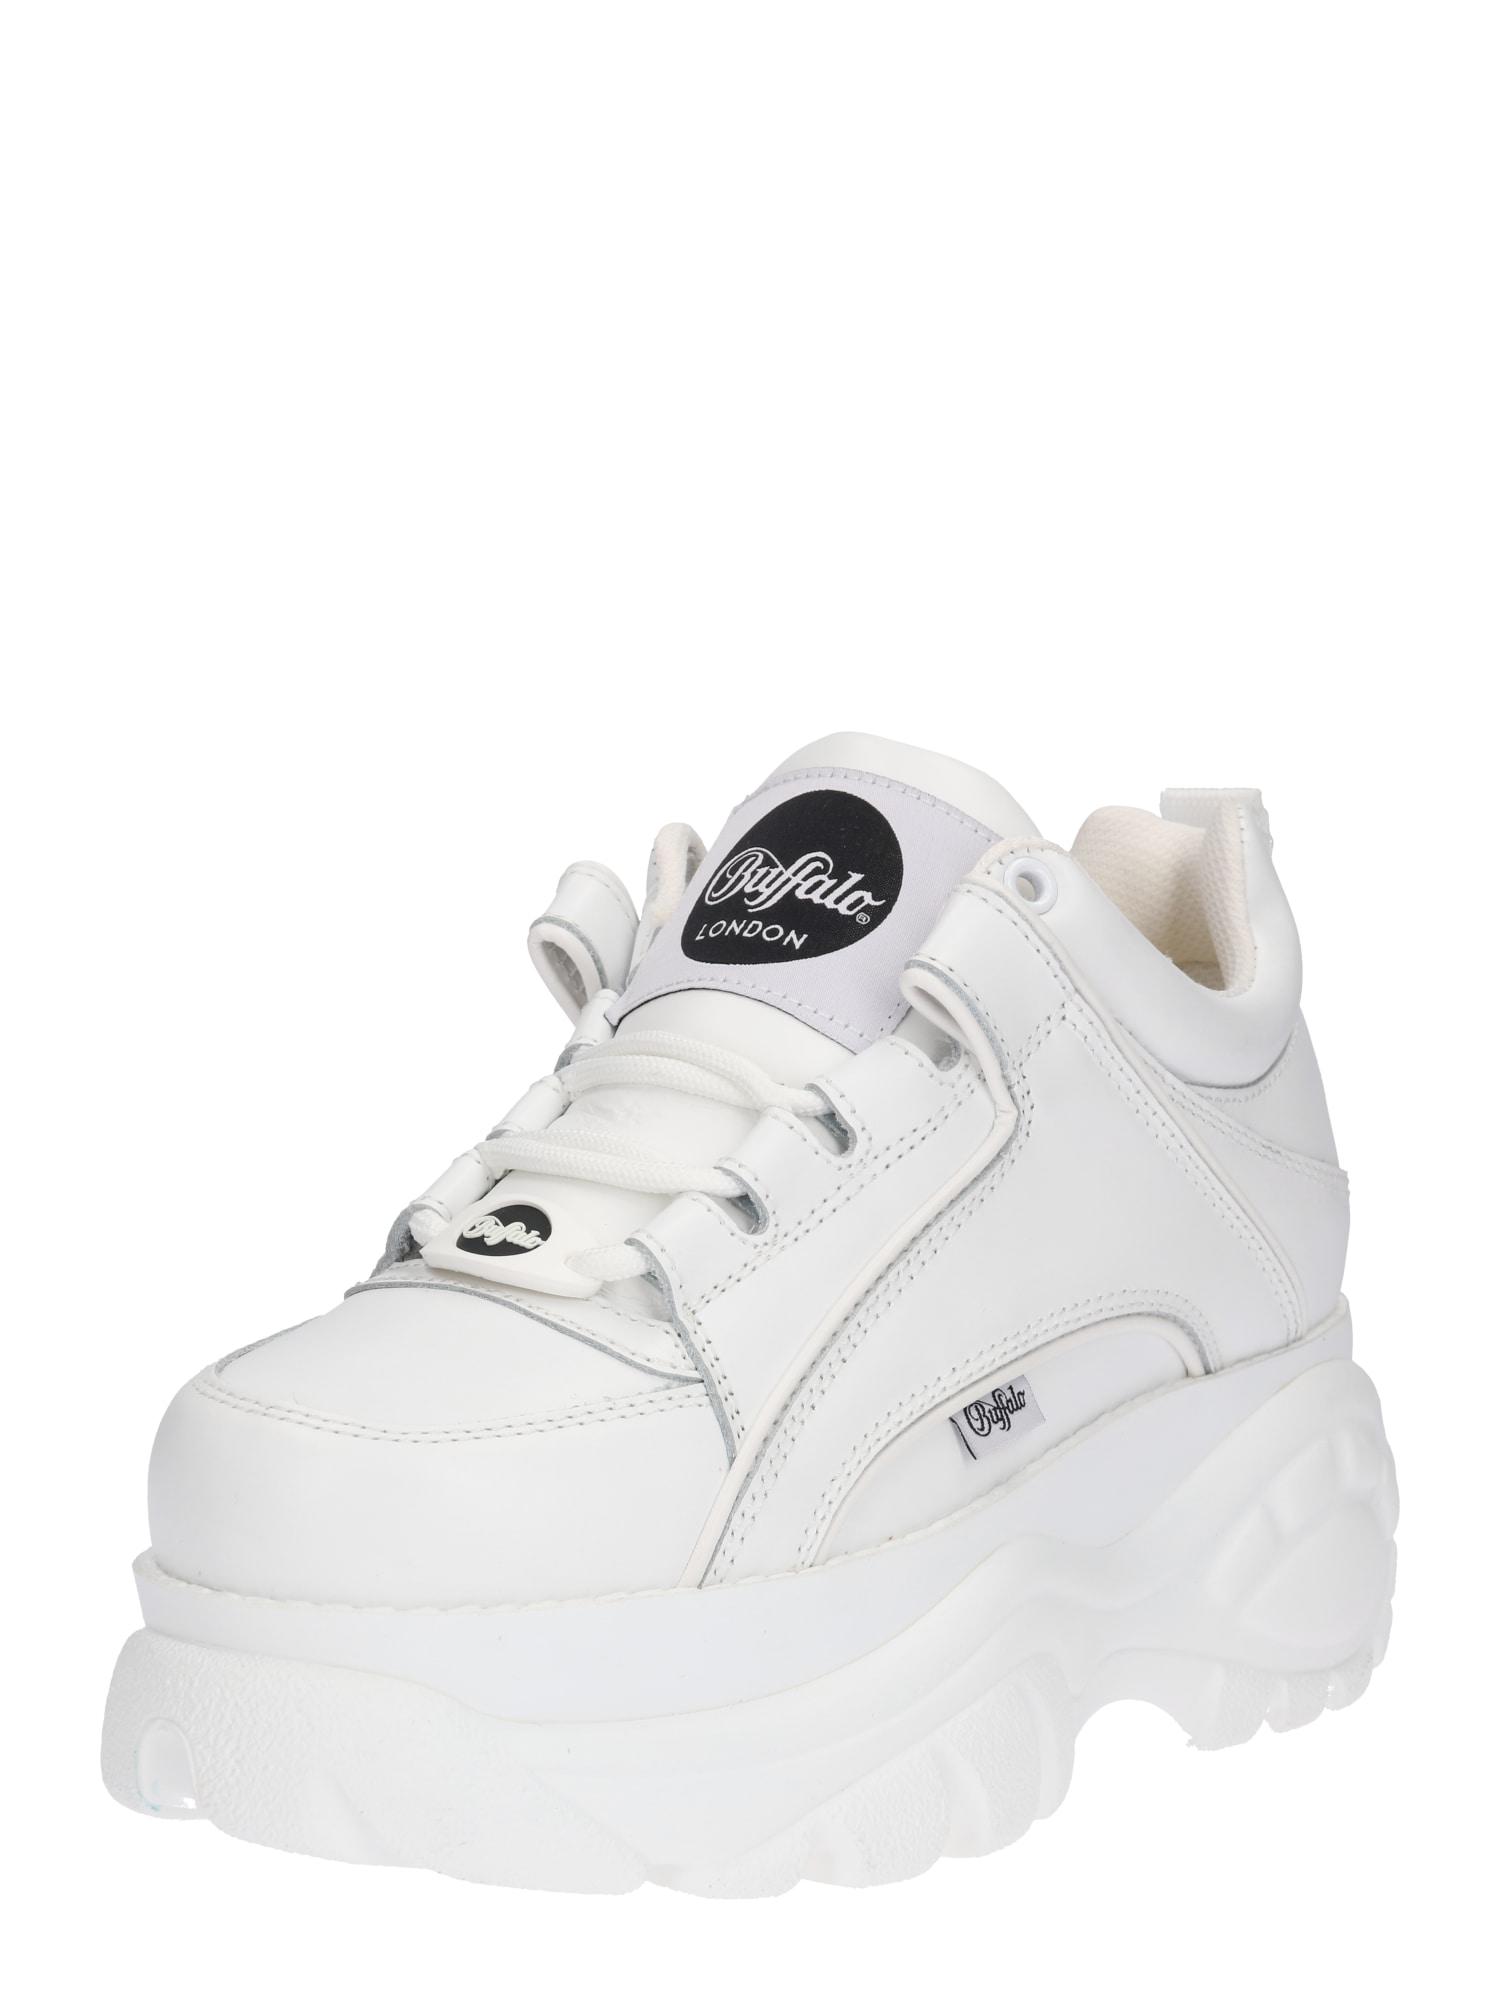 buy popular 8ab2e 900ba AboutYou | Herren Buffalo London Sneaker schwarz, schwarz ...